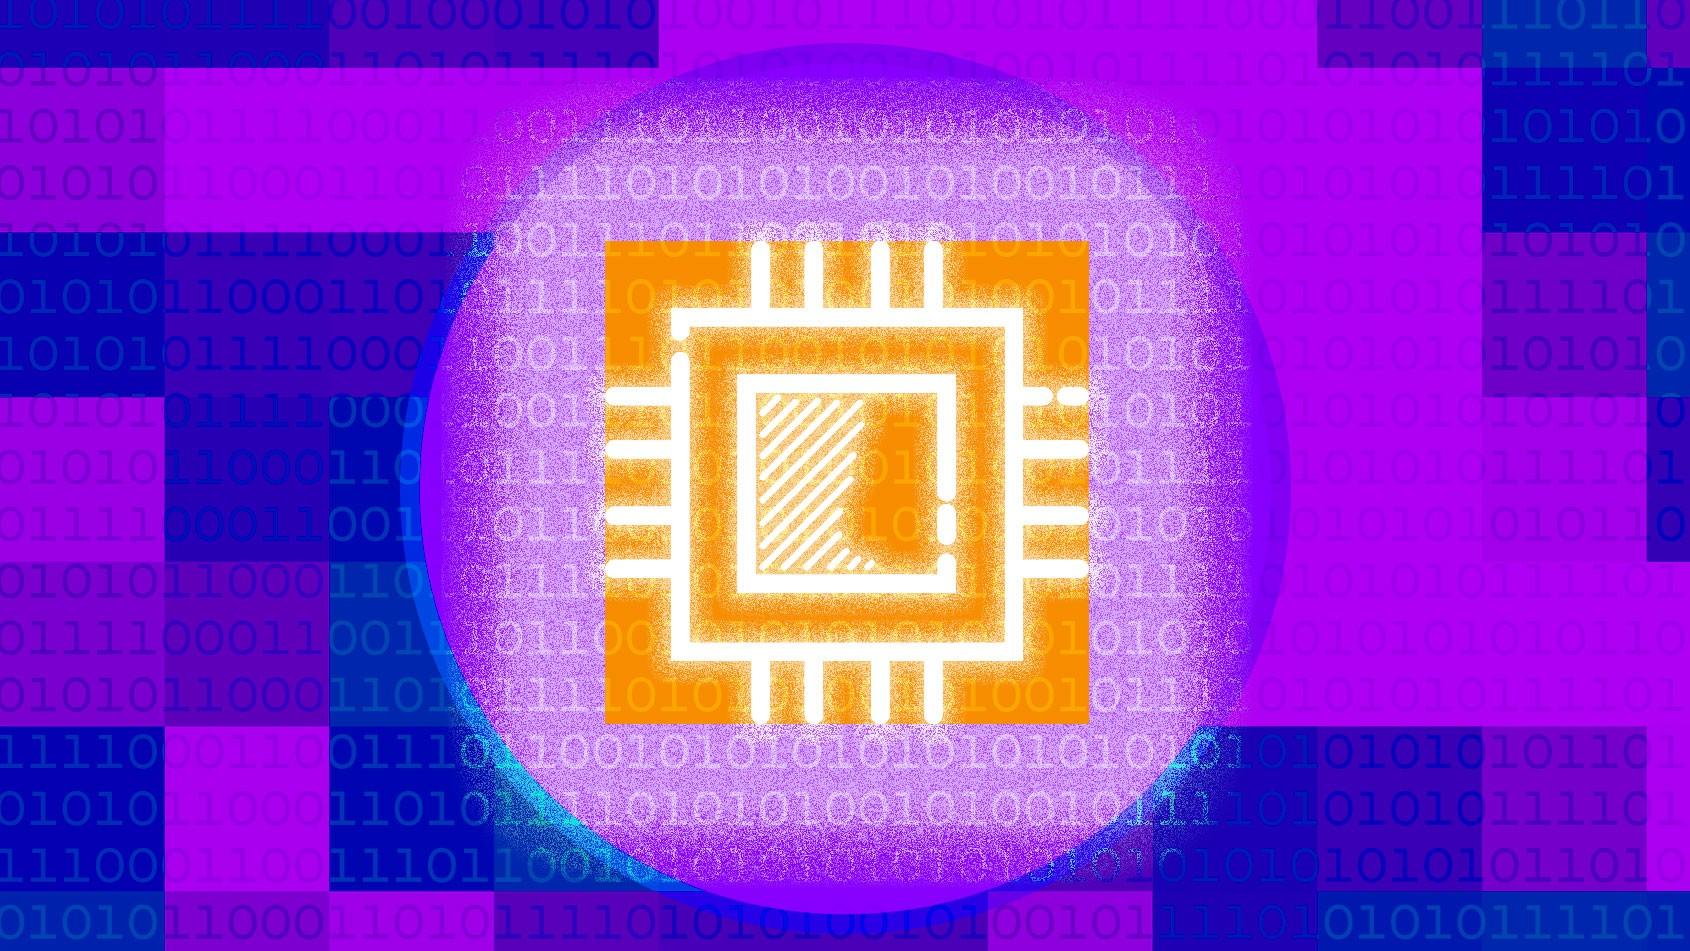 hacking chips